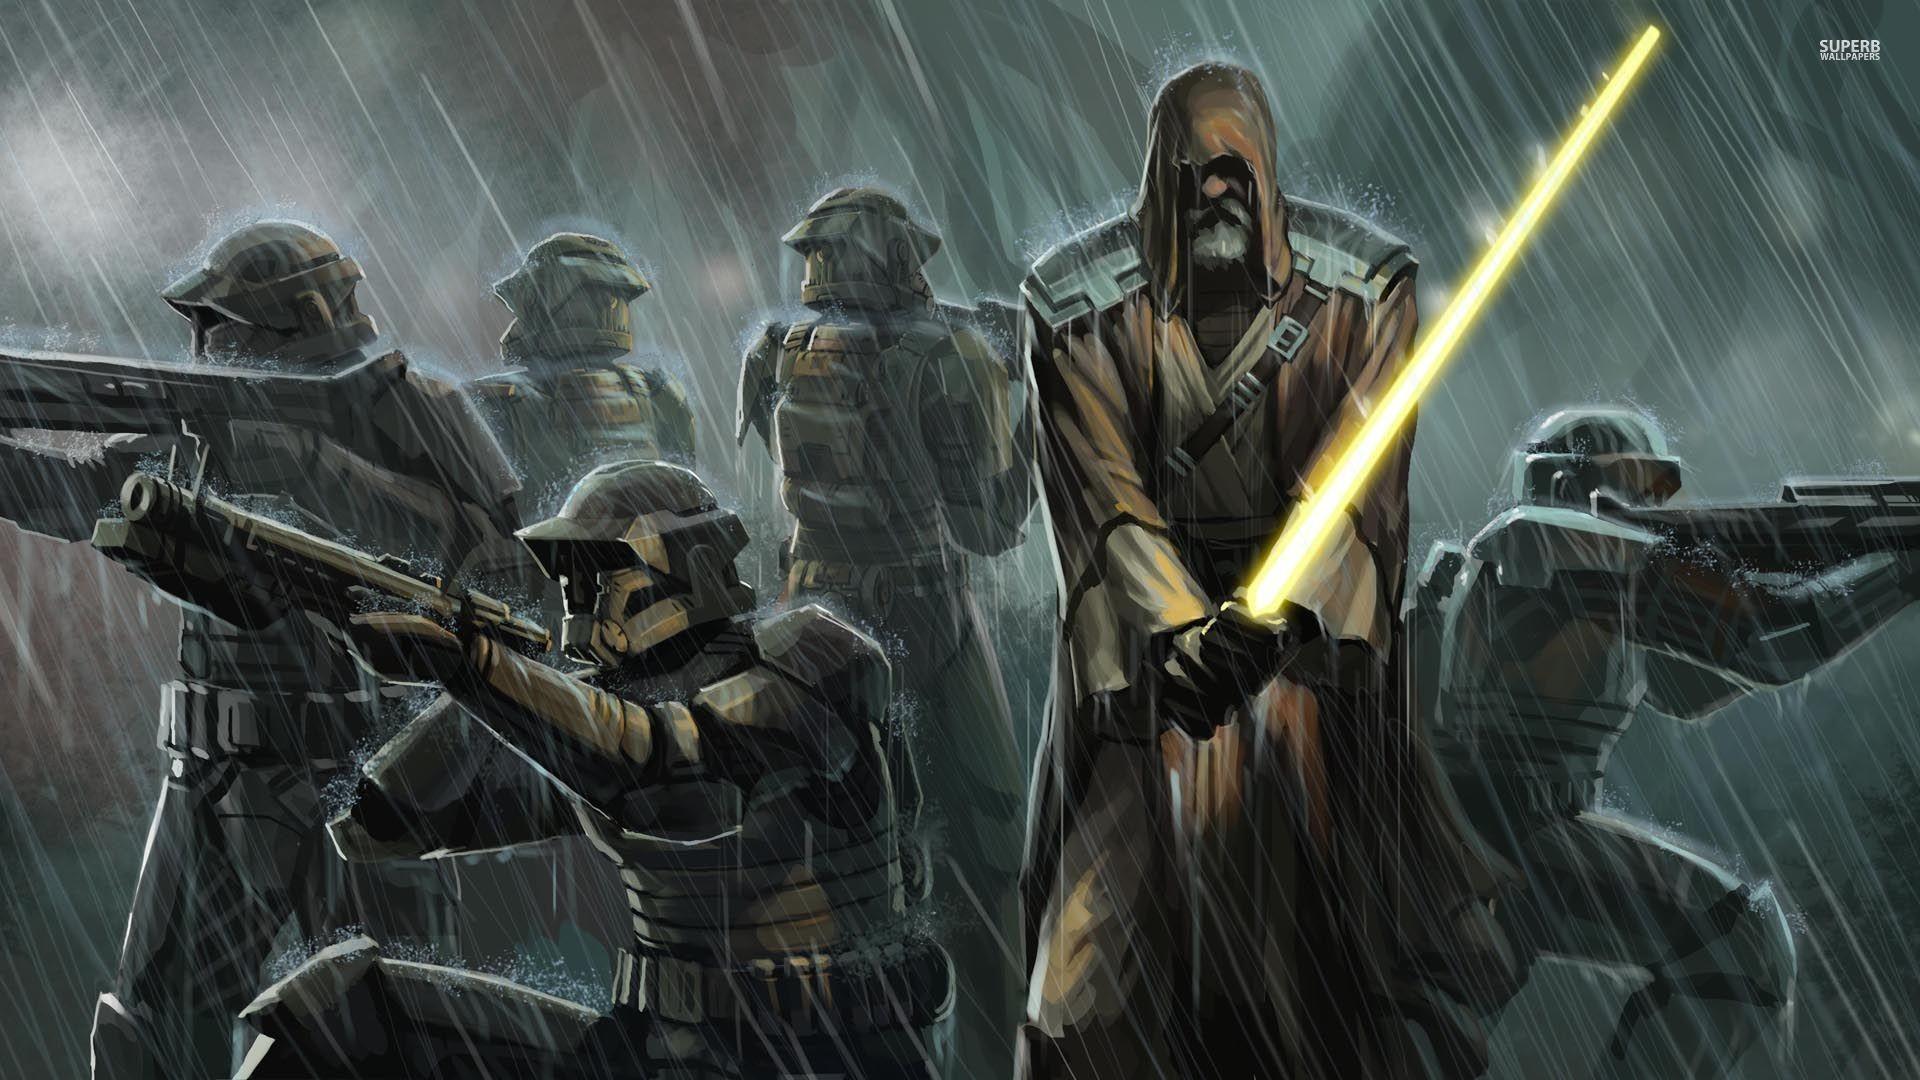 Star Wars Concept Art Wallpaper 67 Images